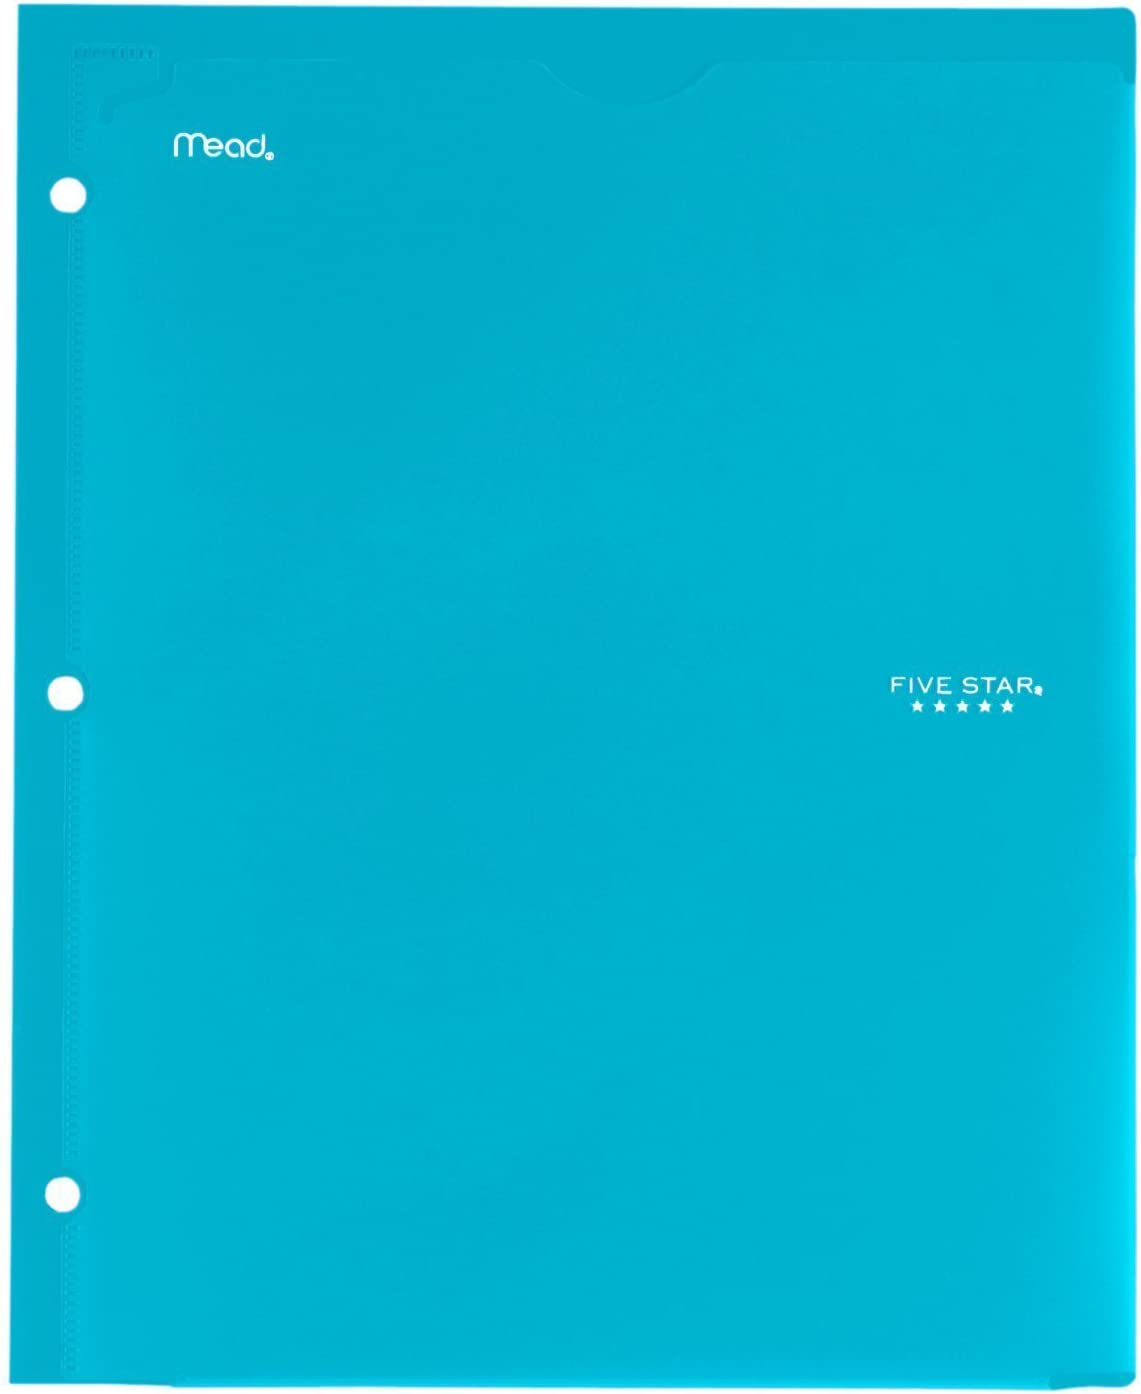 2 Pocket Folder Customizable Cover Black Folder with Pockets 38098 Plastic Green Fits 3 Ring Binder New Version 4 Pack Blue Red